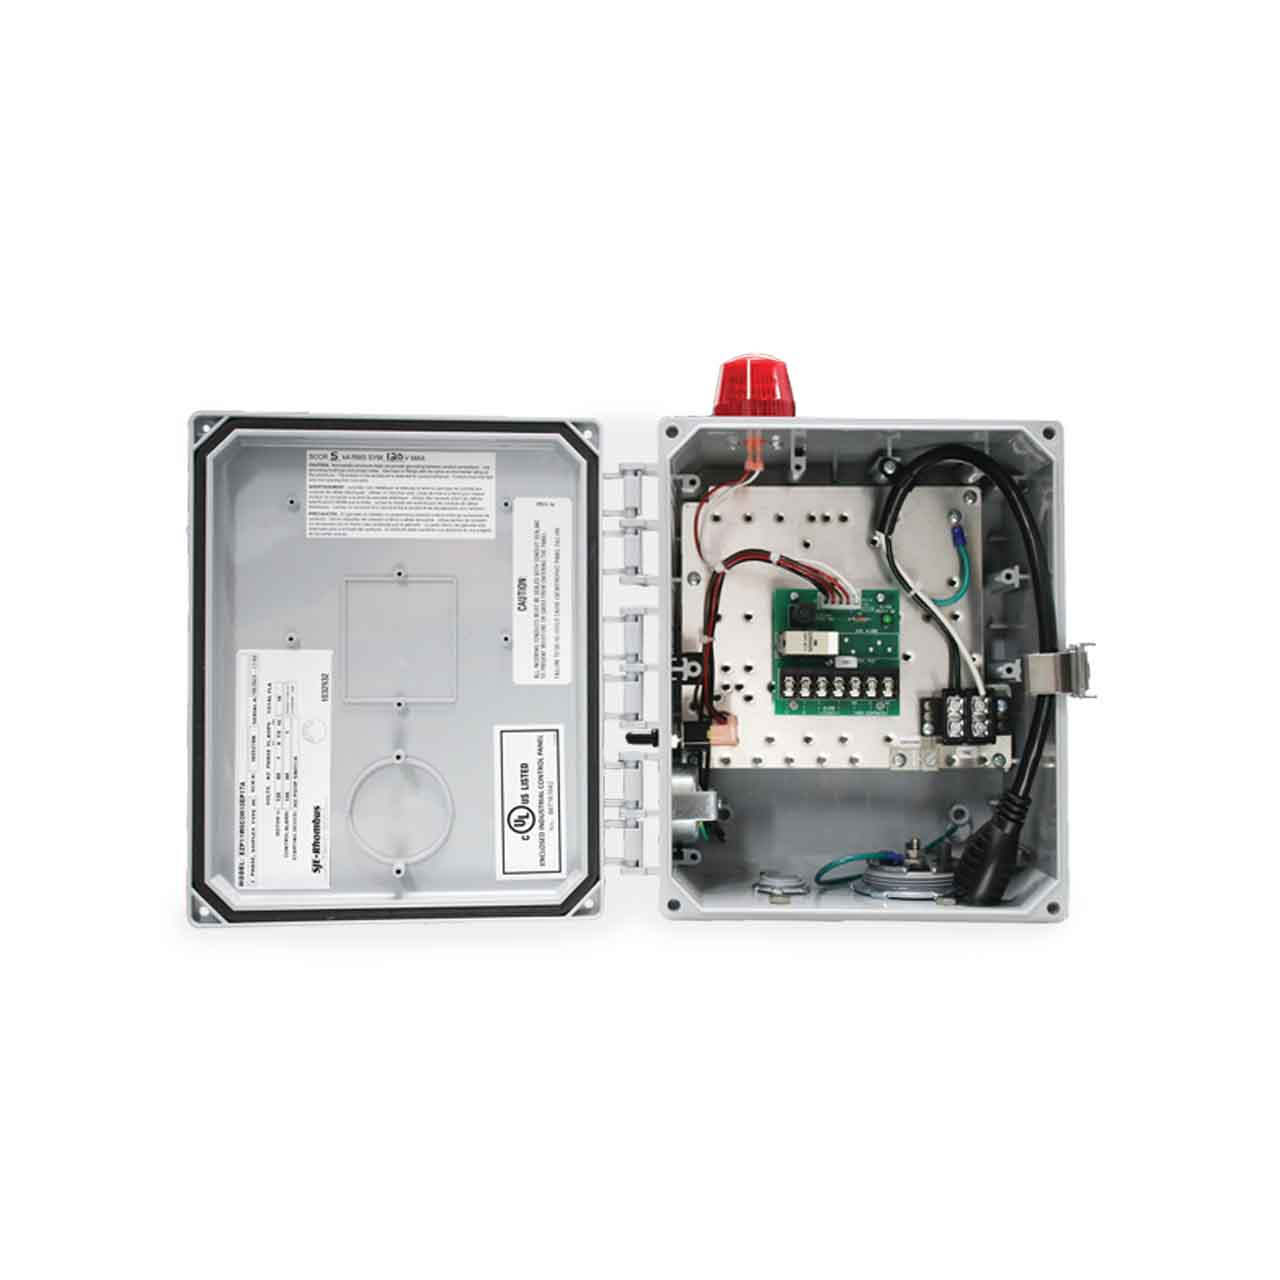 small resolution of sje rhombus sje rhombus ezp series plugger plug in pump control rhombus septic control wiring diagram